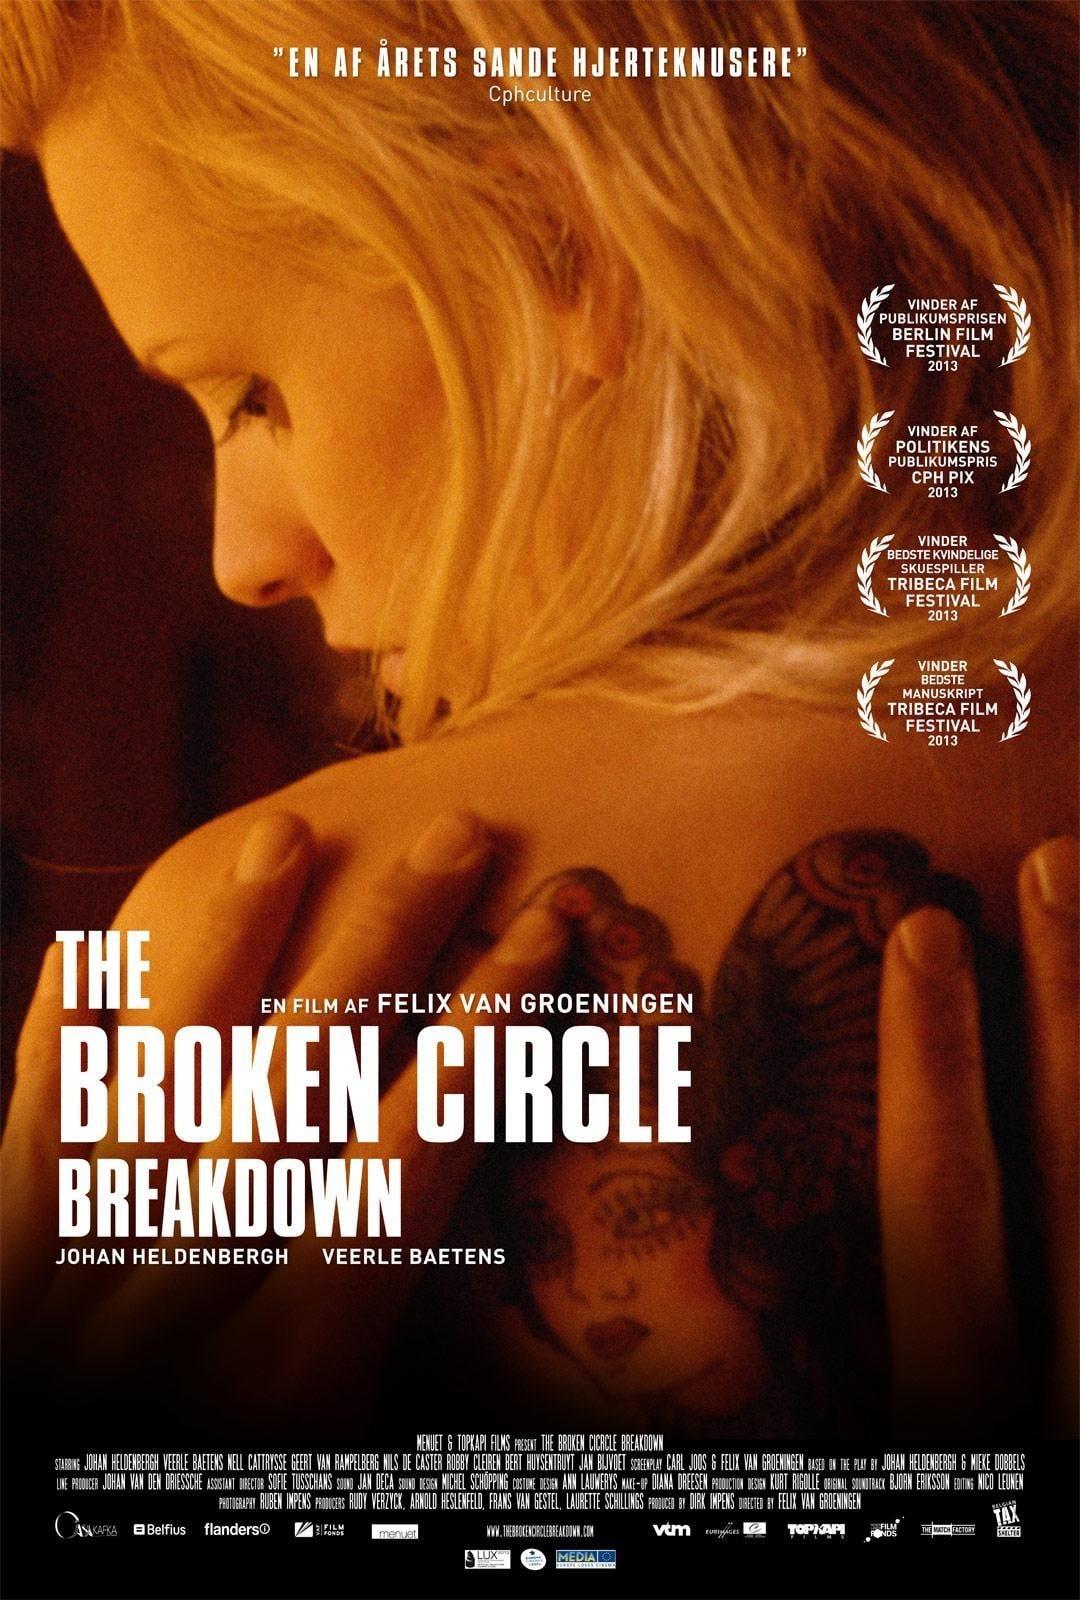 The Broken Circle Breakdown (2012) - Posters — The Movie ...